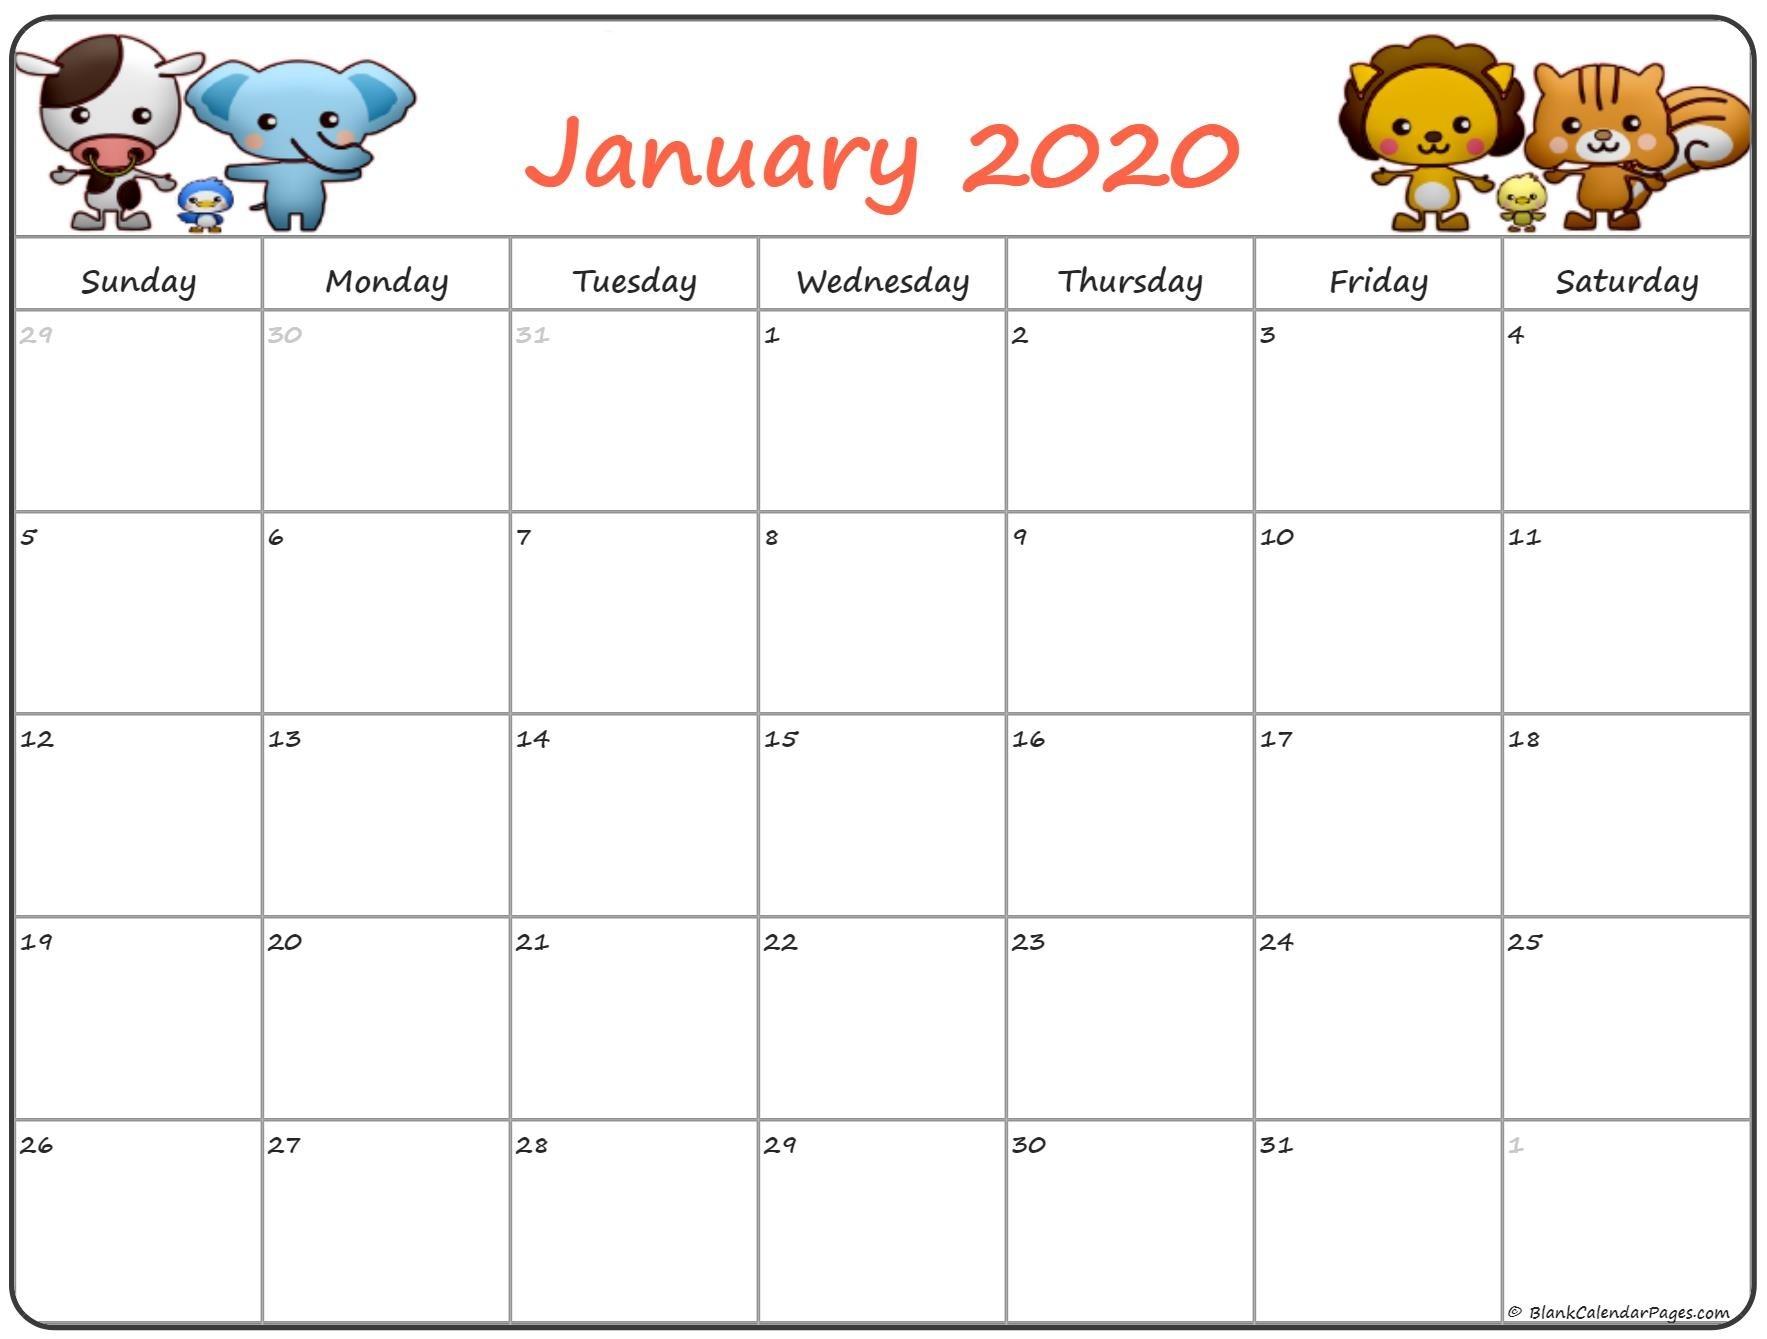 January 2020 Pregnancy Calendar | Fertility Calendar-Cute January 2020 Calendar